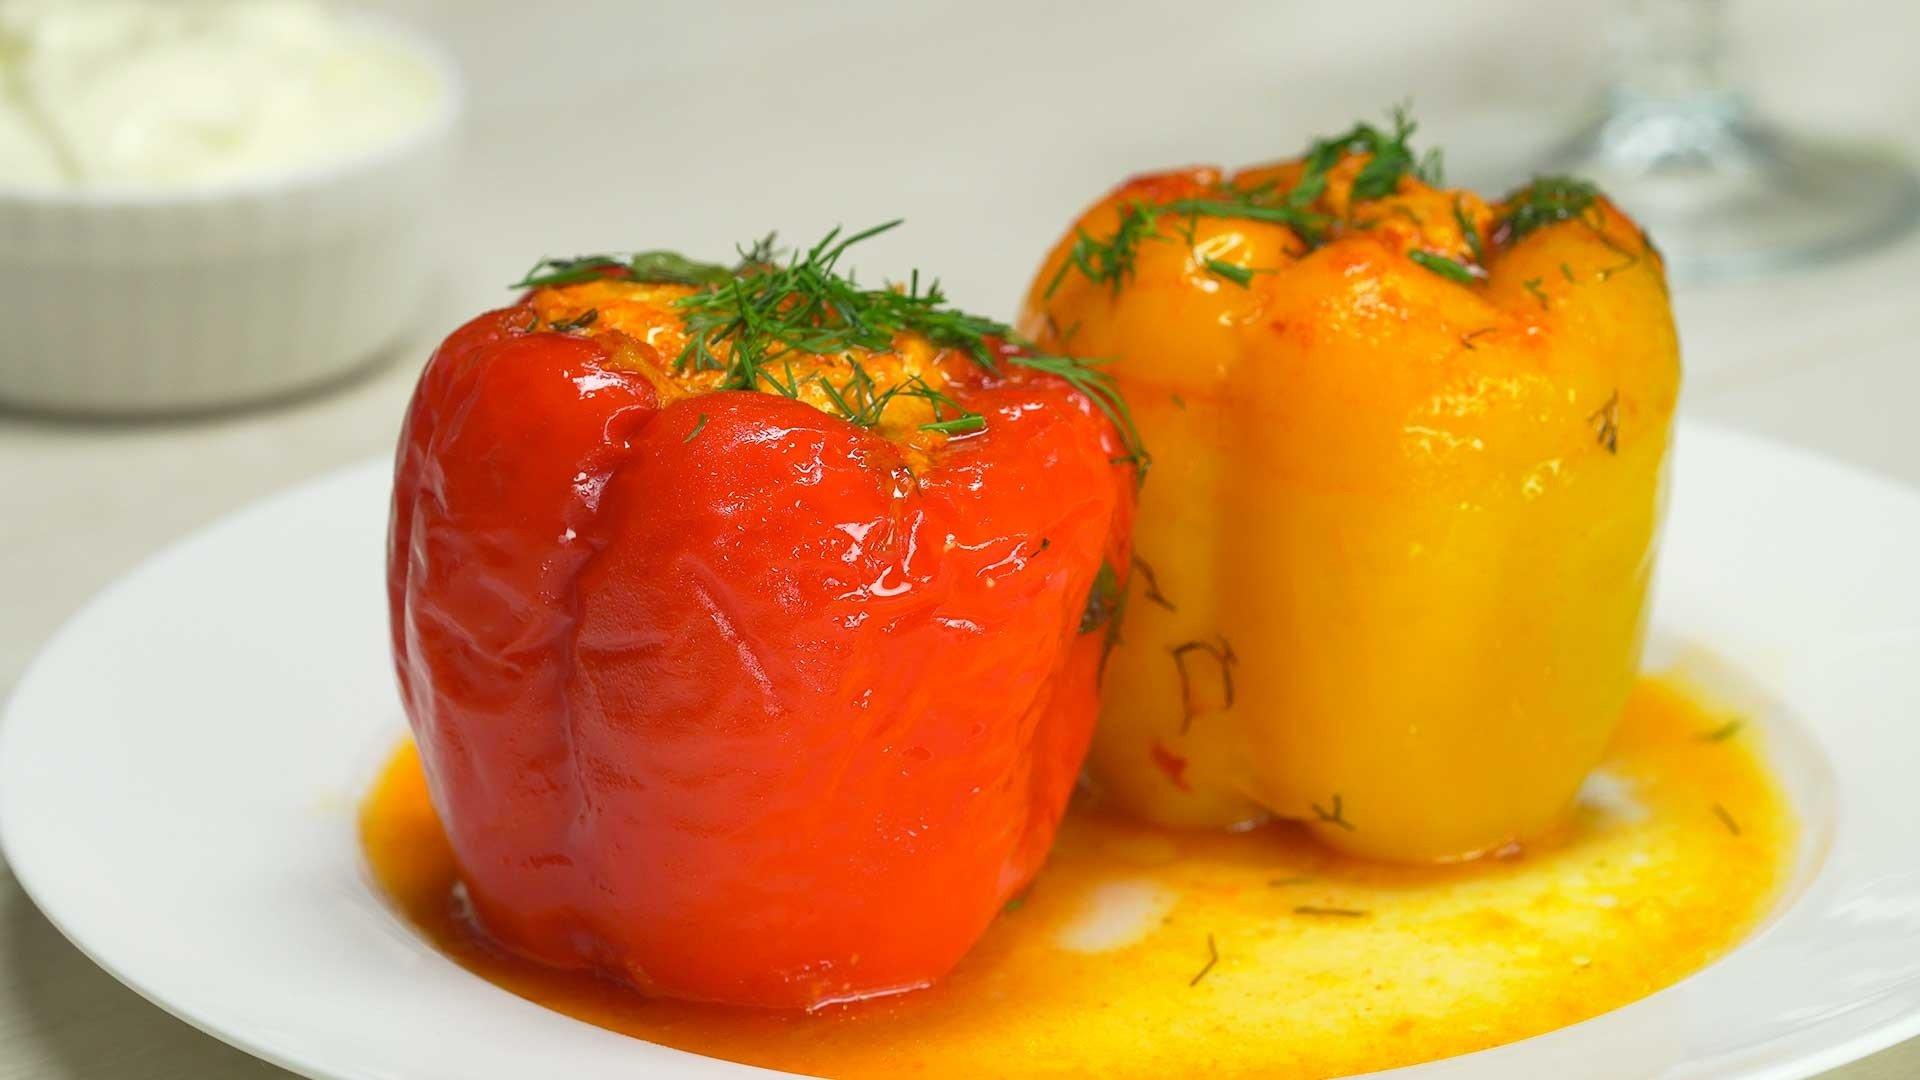 Фарширований перець: рецепт смачної страви з курячого м'яса нашвидкуруч - today.ua